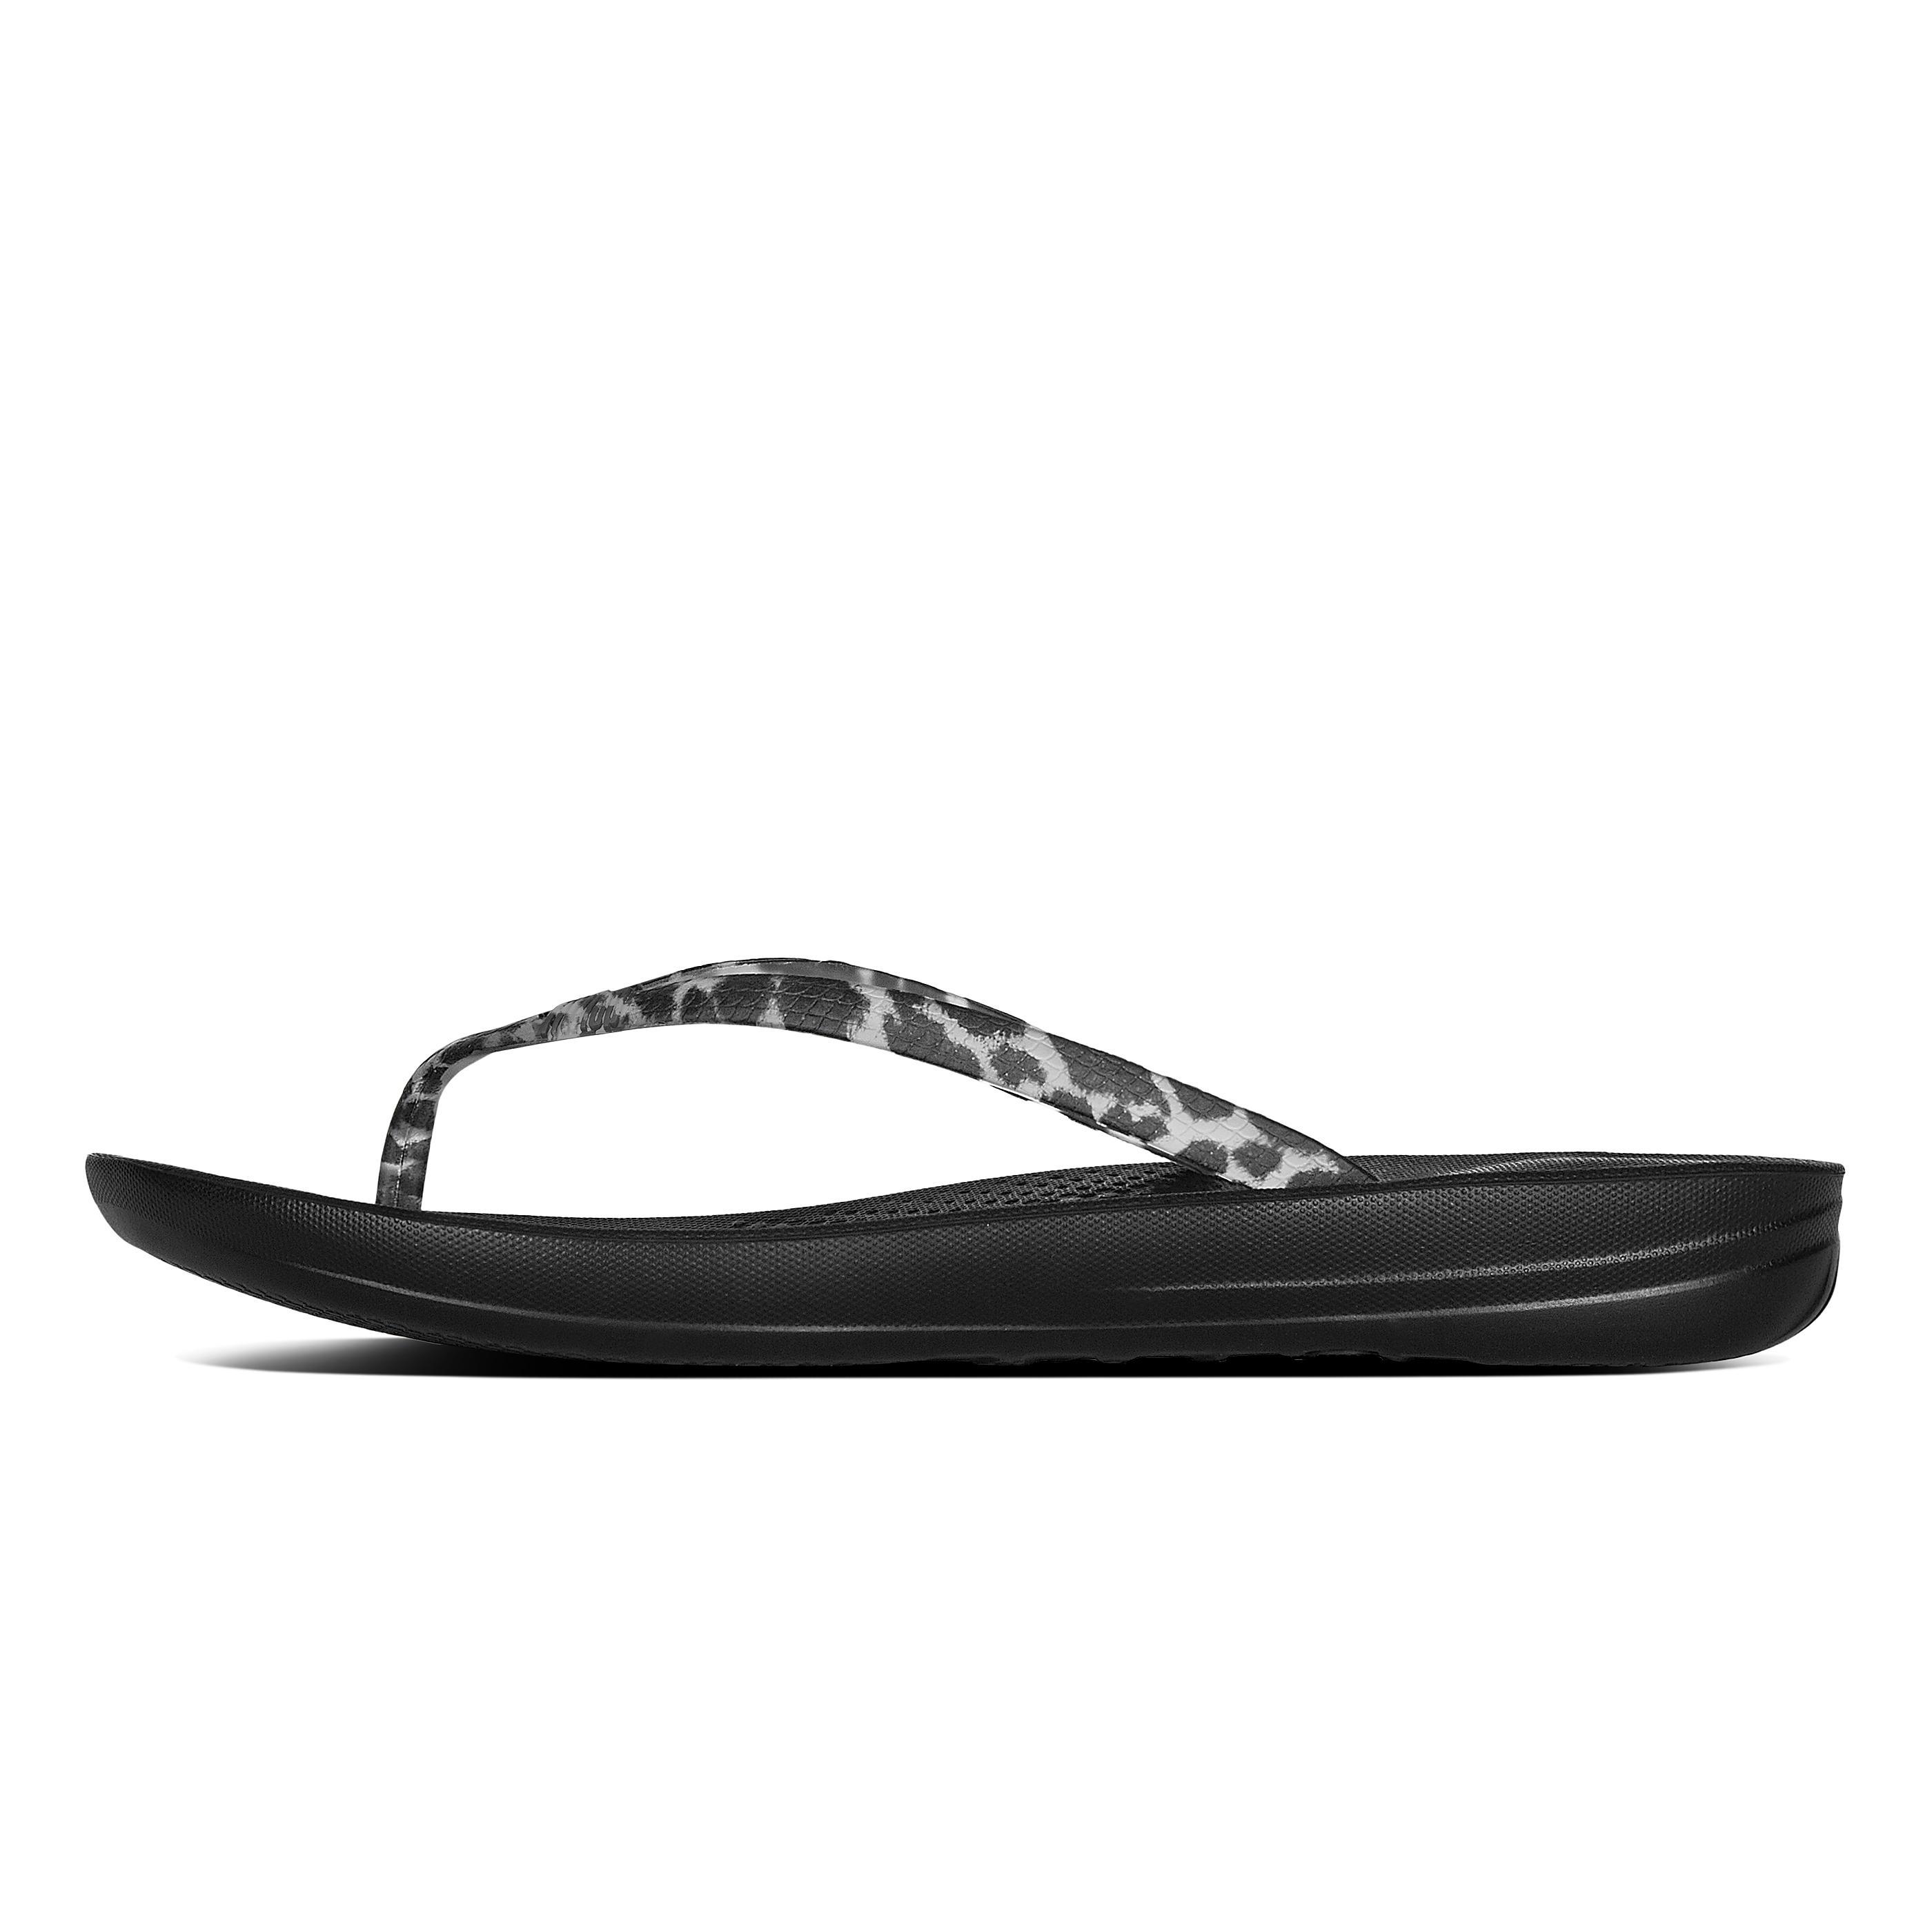 yoga flop nordstrom mats flip mat sanuk c shoes